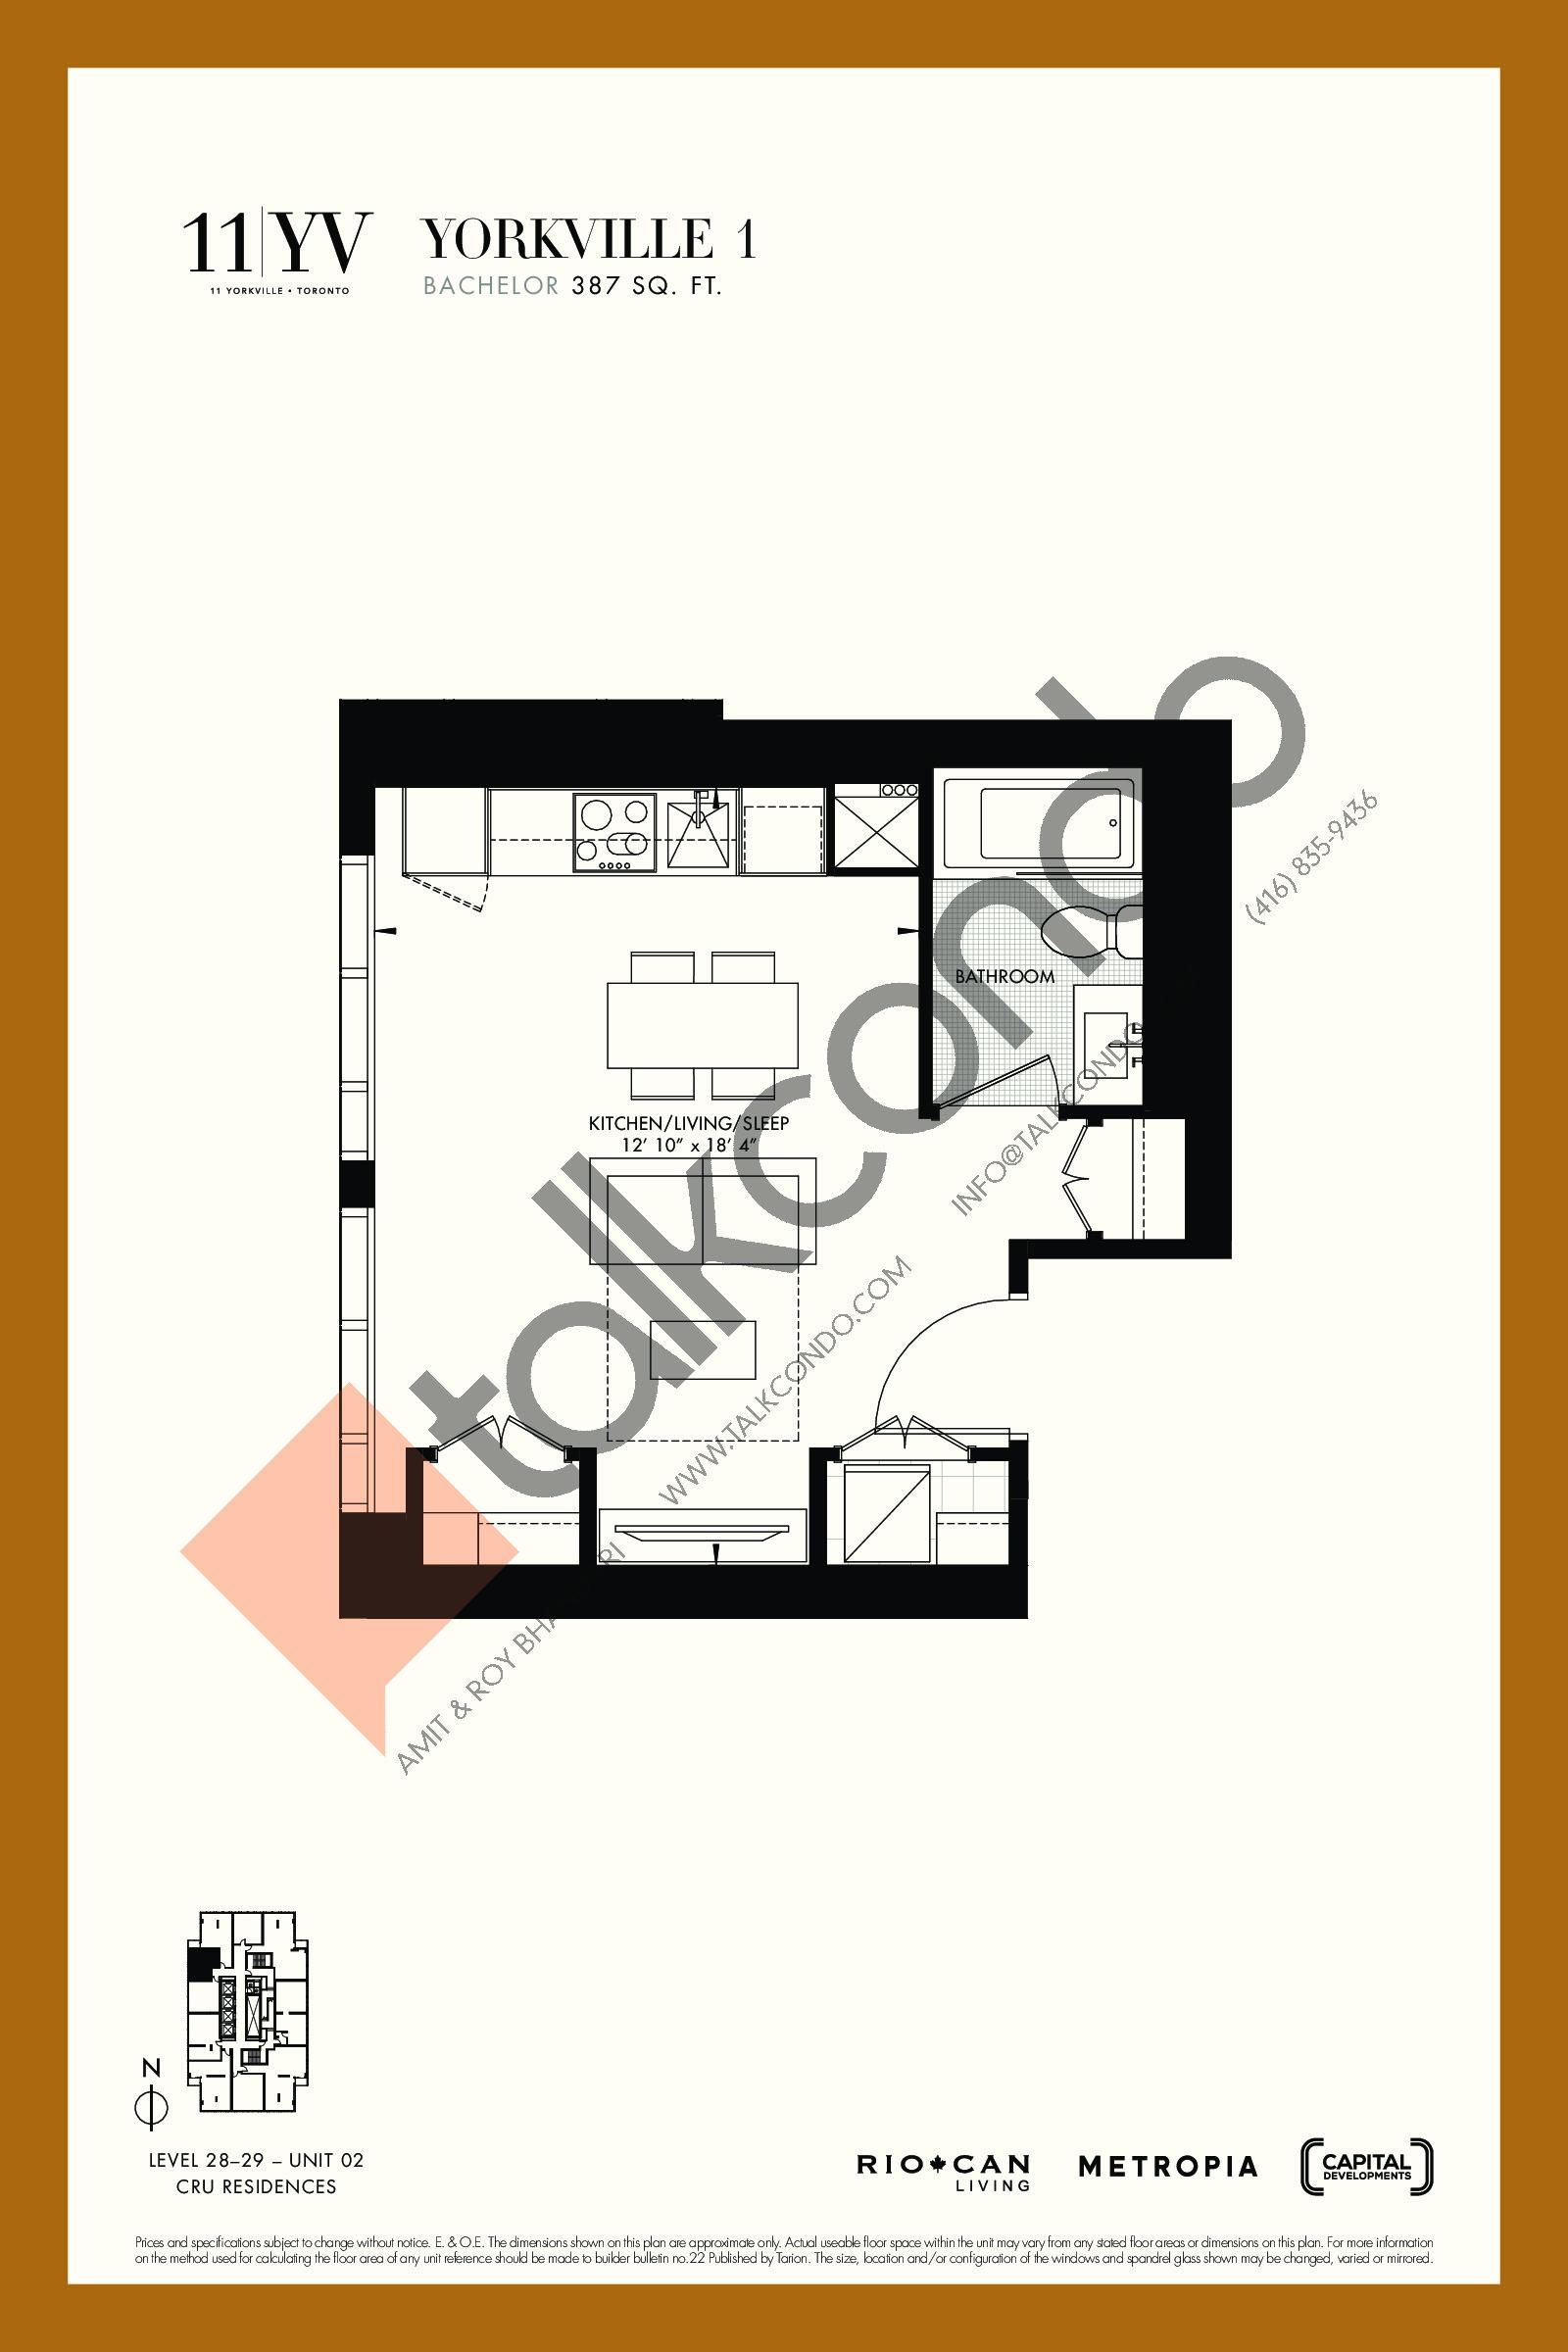 Yorkville 1 Floor Plan at 11YV Condos - 387 sq.ft